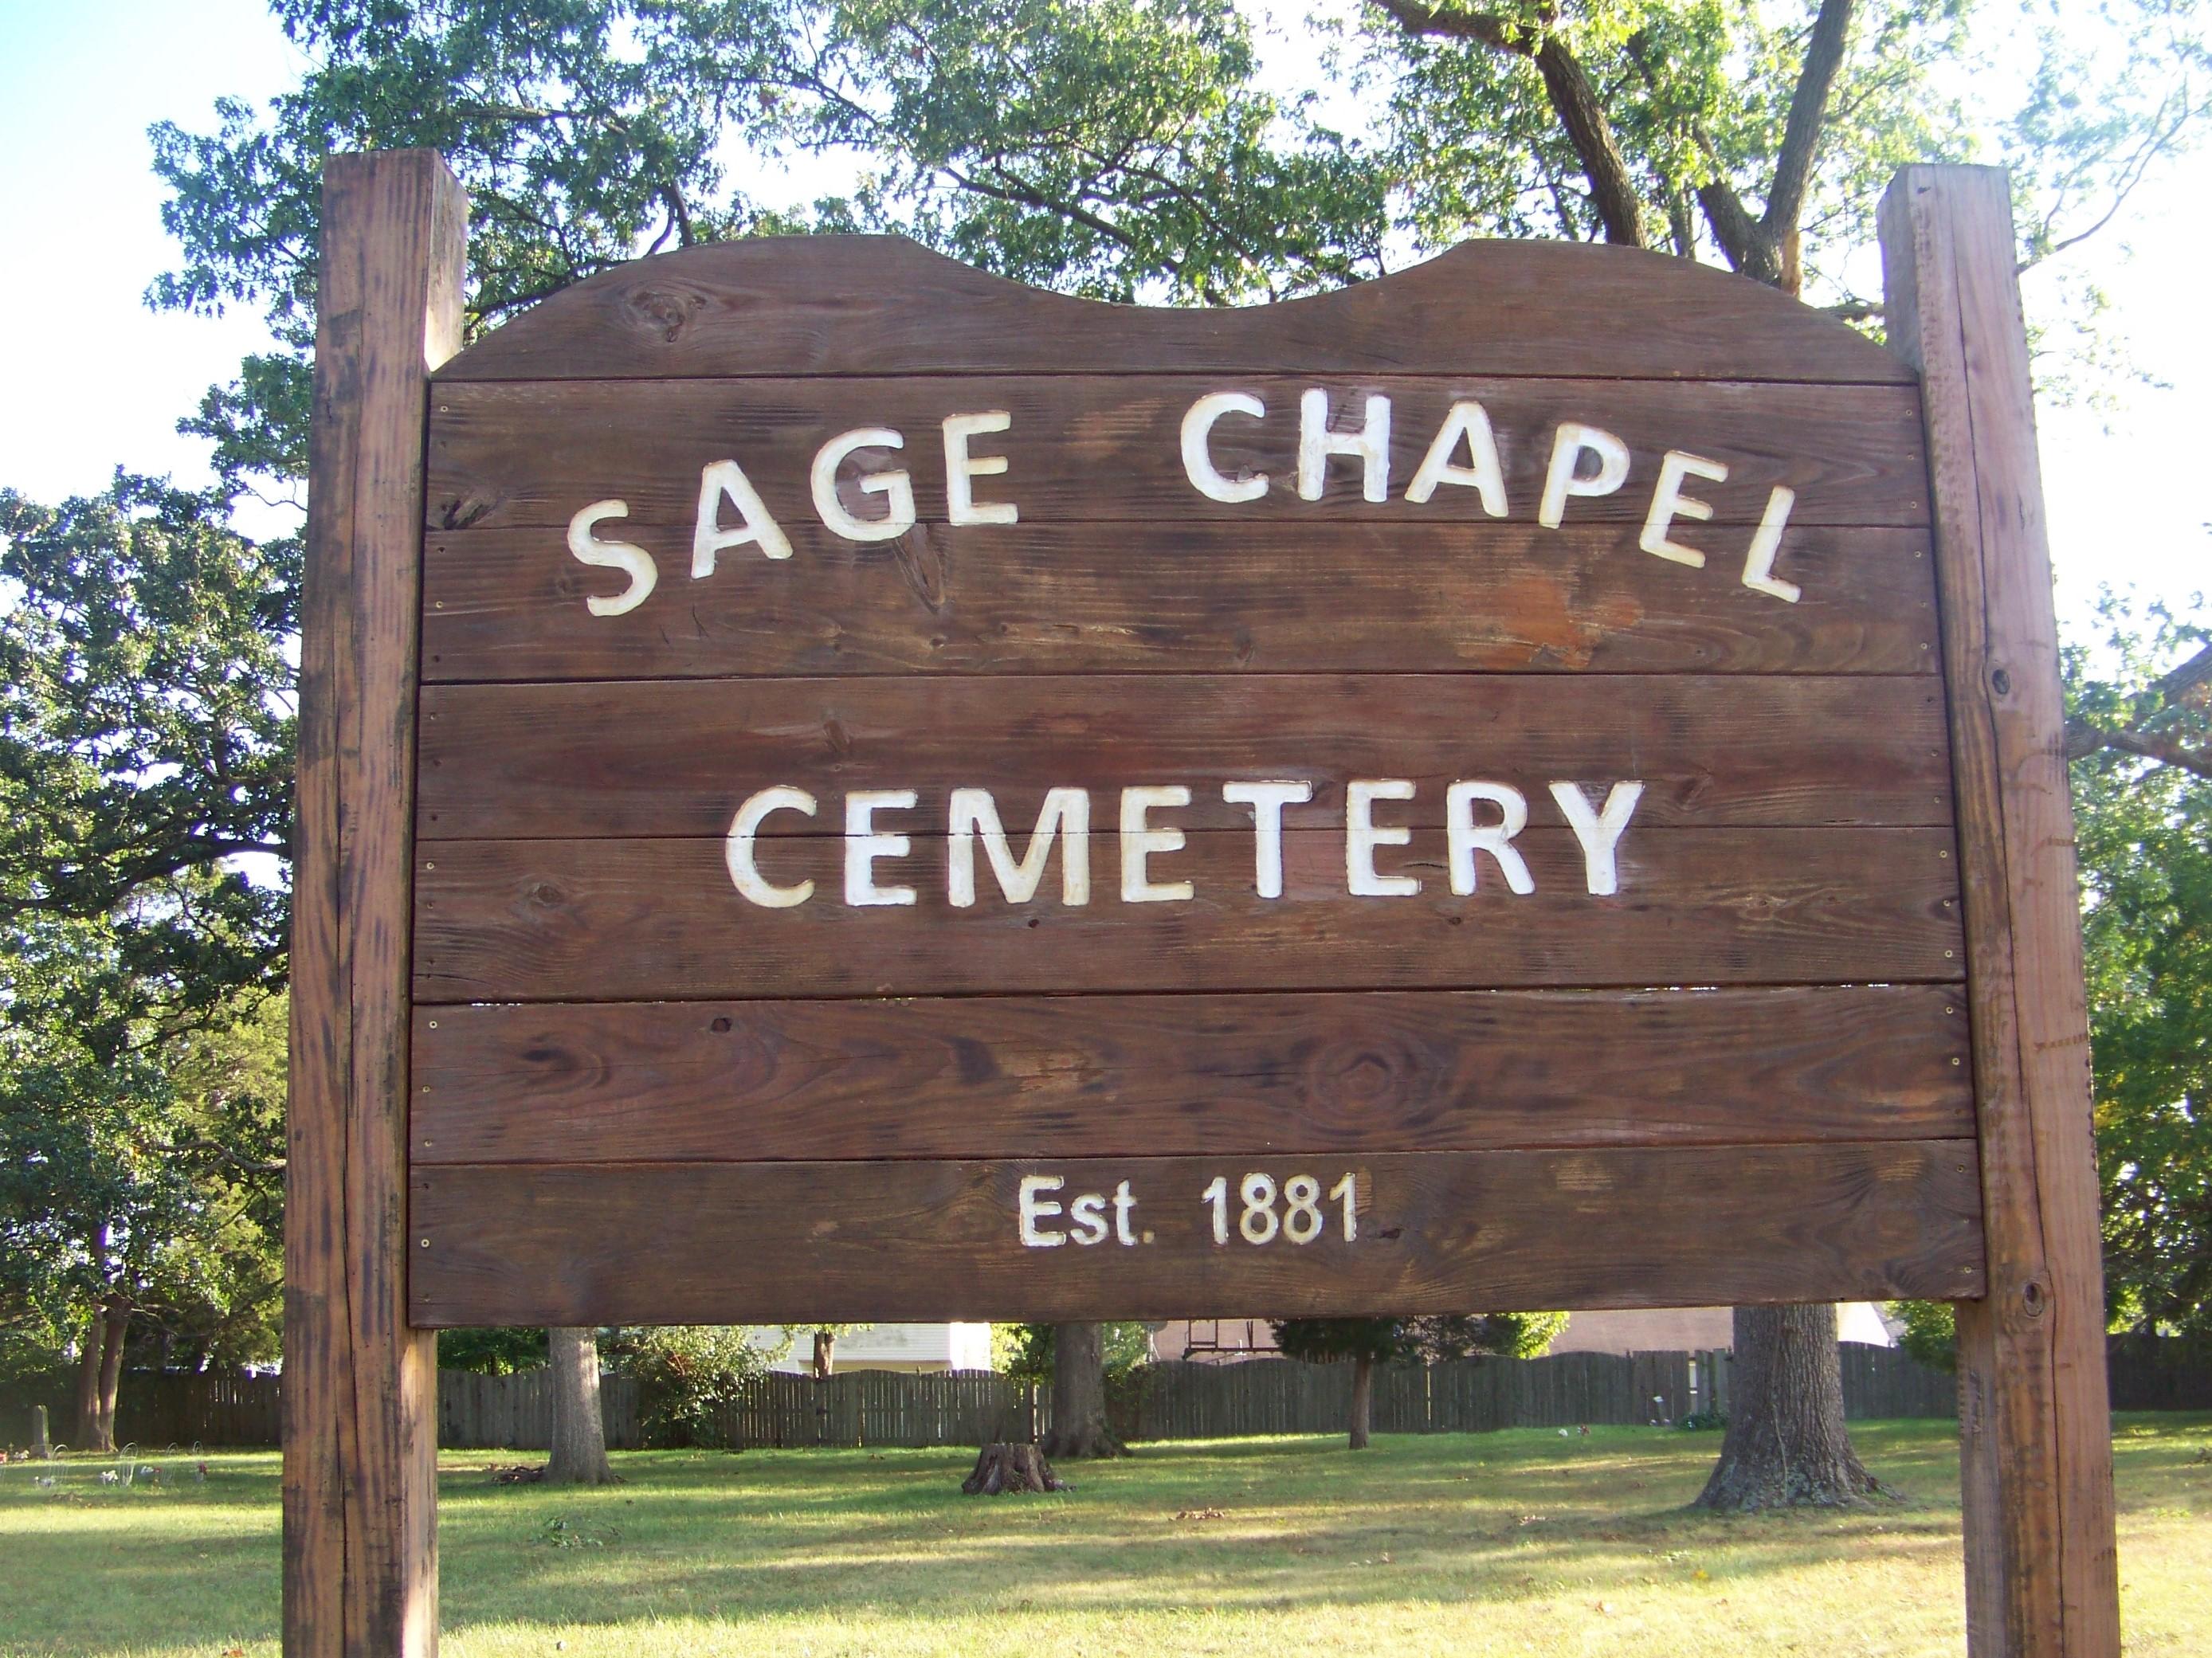 Sage Chapel Cemetery